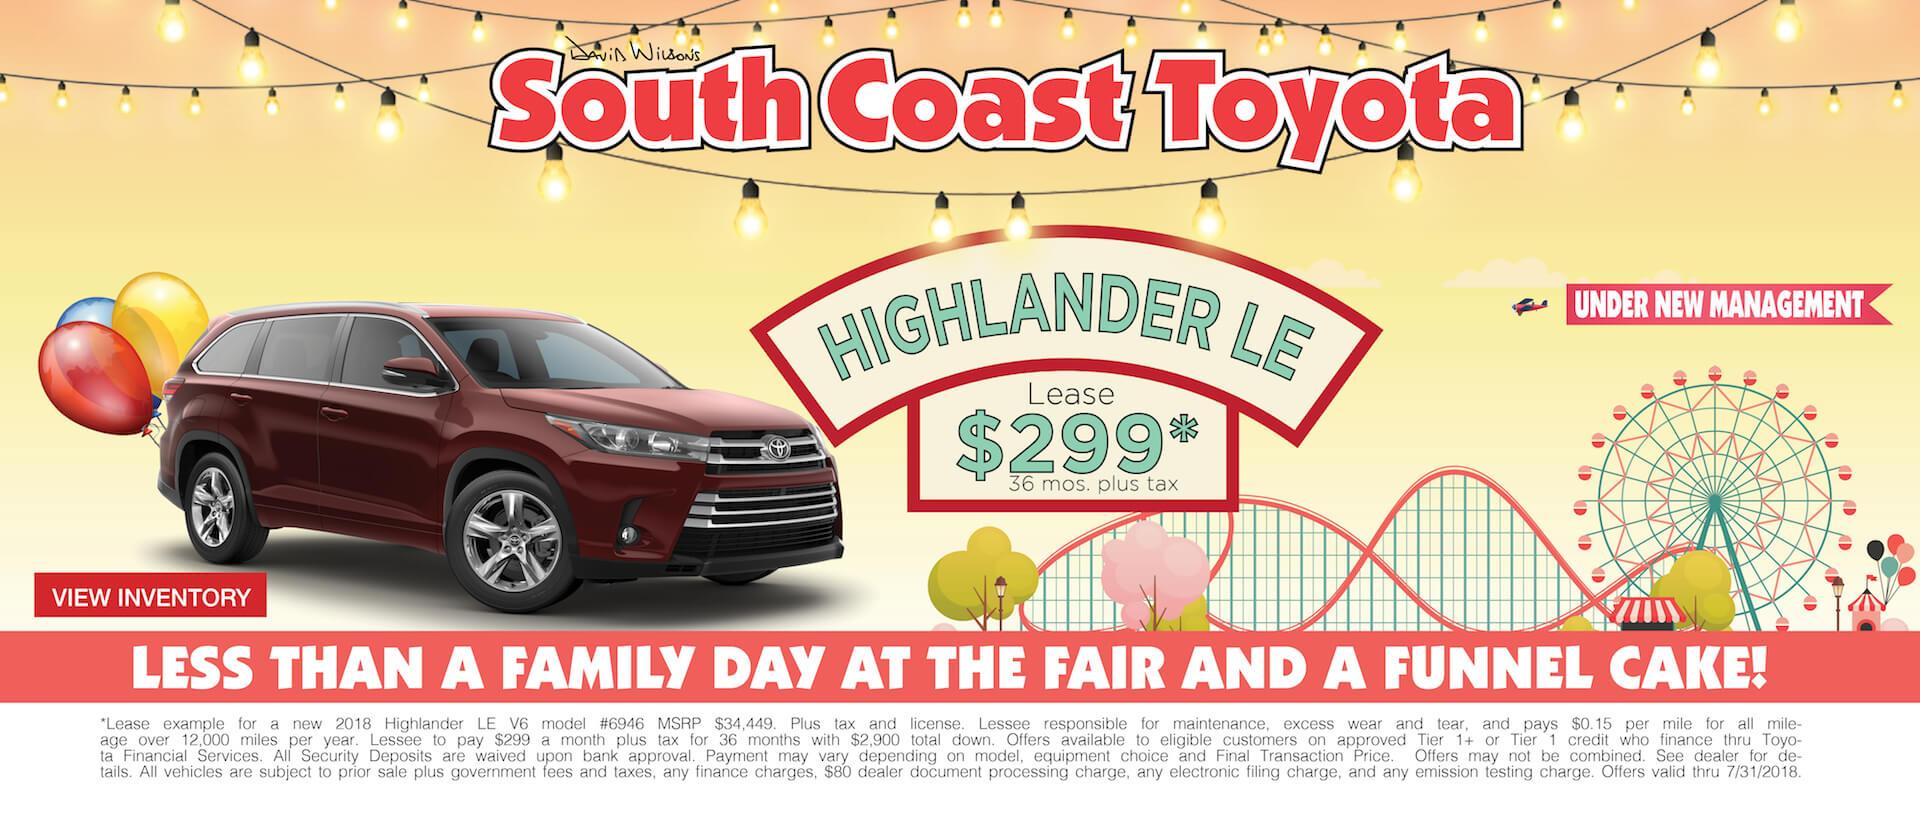 Memorial Day Toyota Highlander $299 Lease